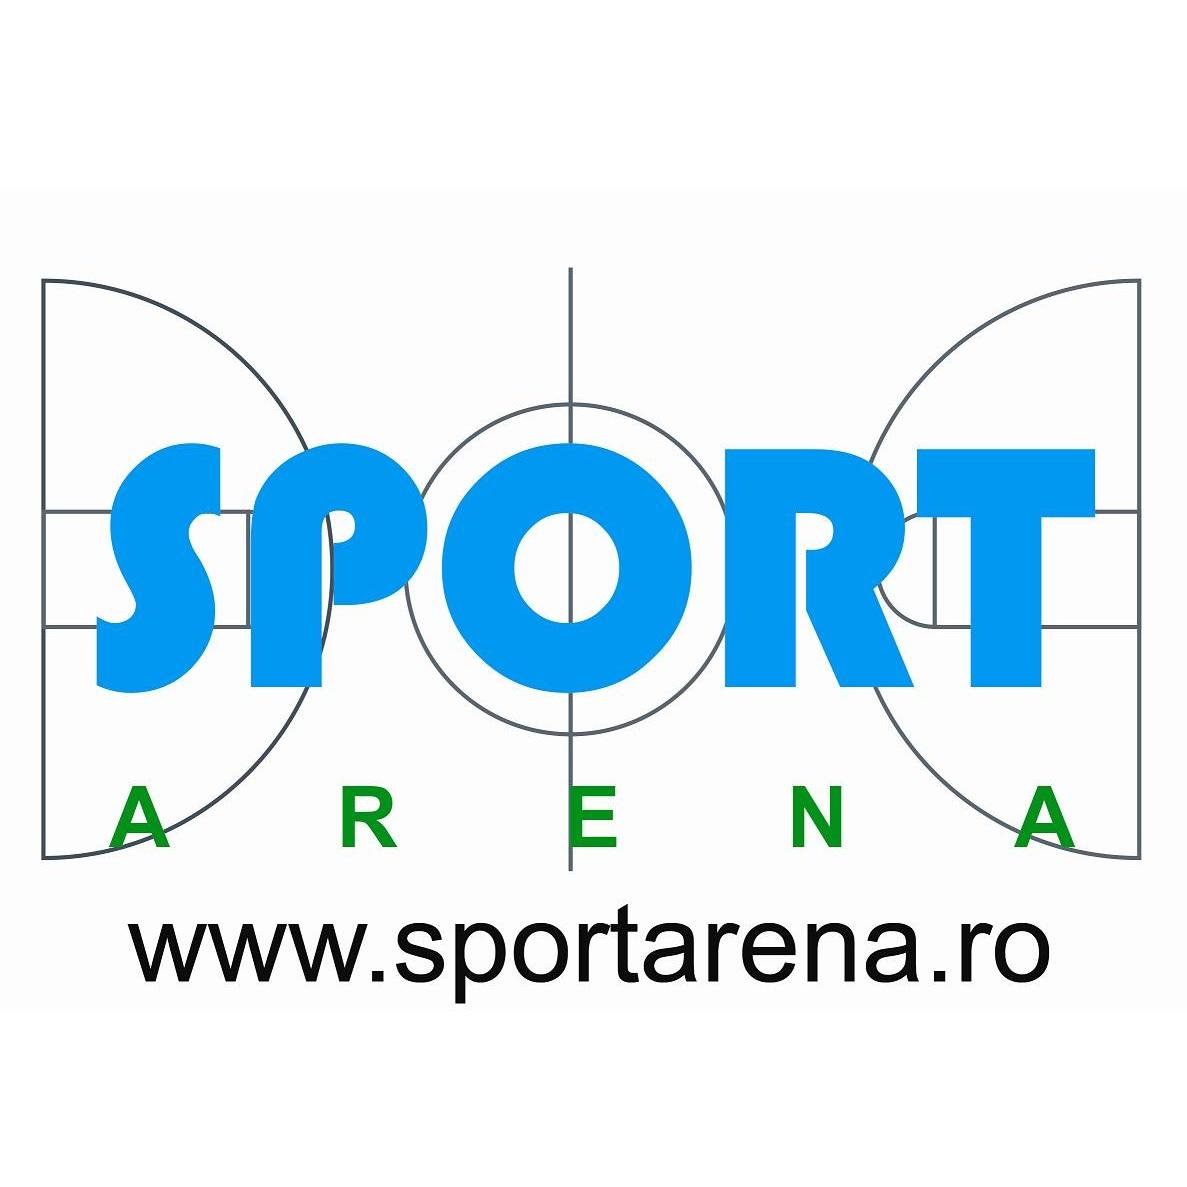 sport-arena-logo-patrat